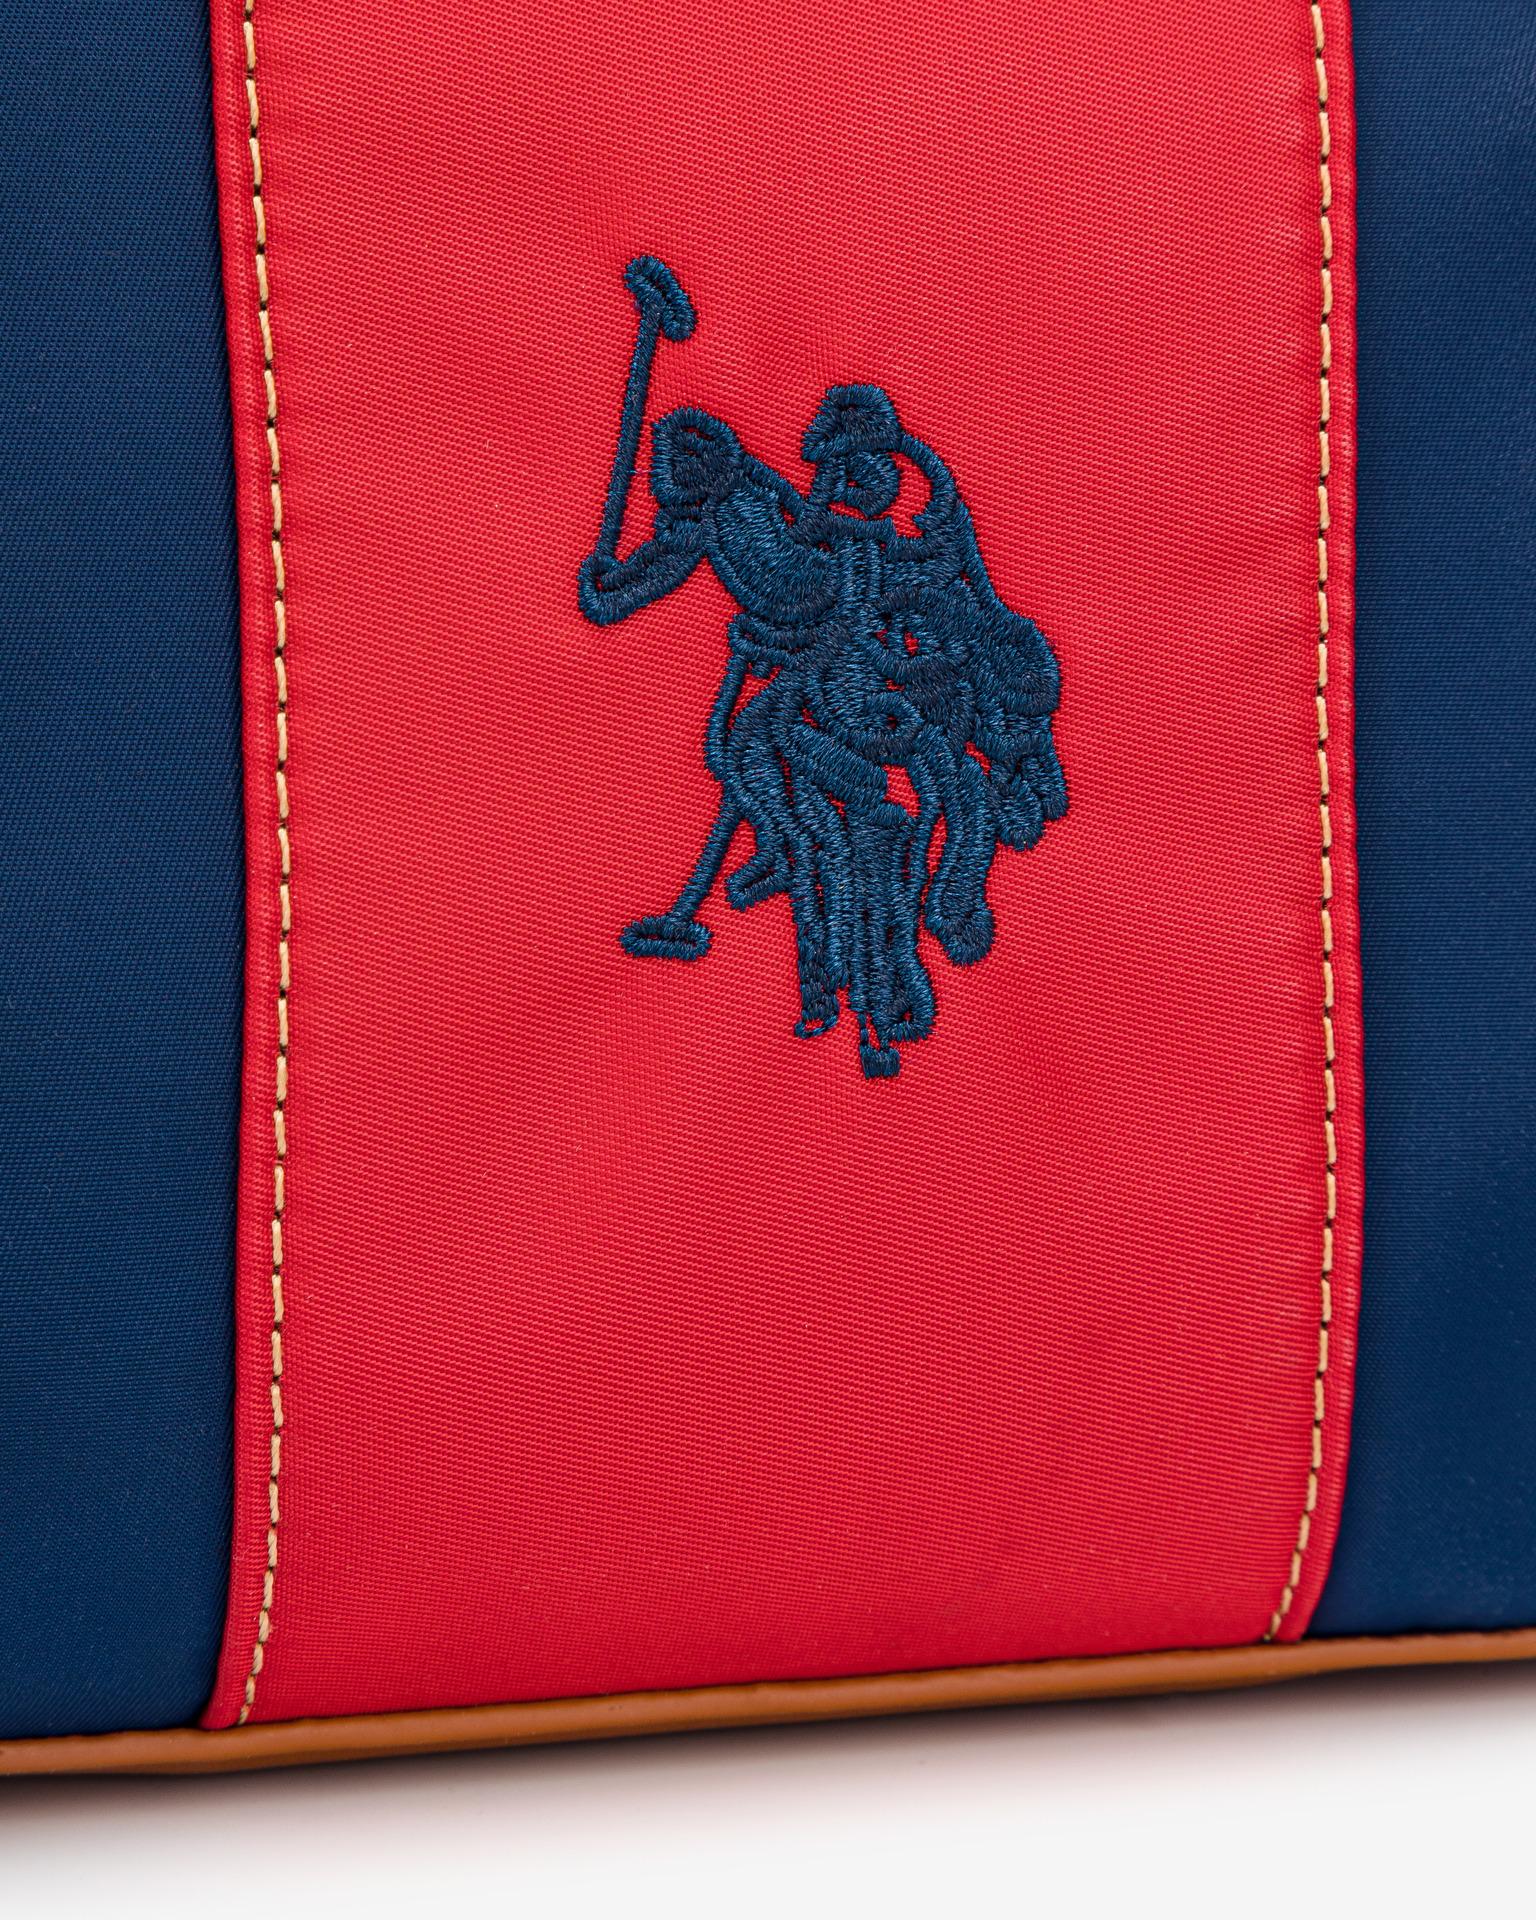 U.S. Polo Assn. Borsetta donna blu  U.S.